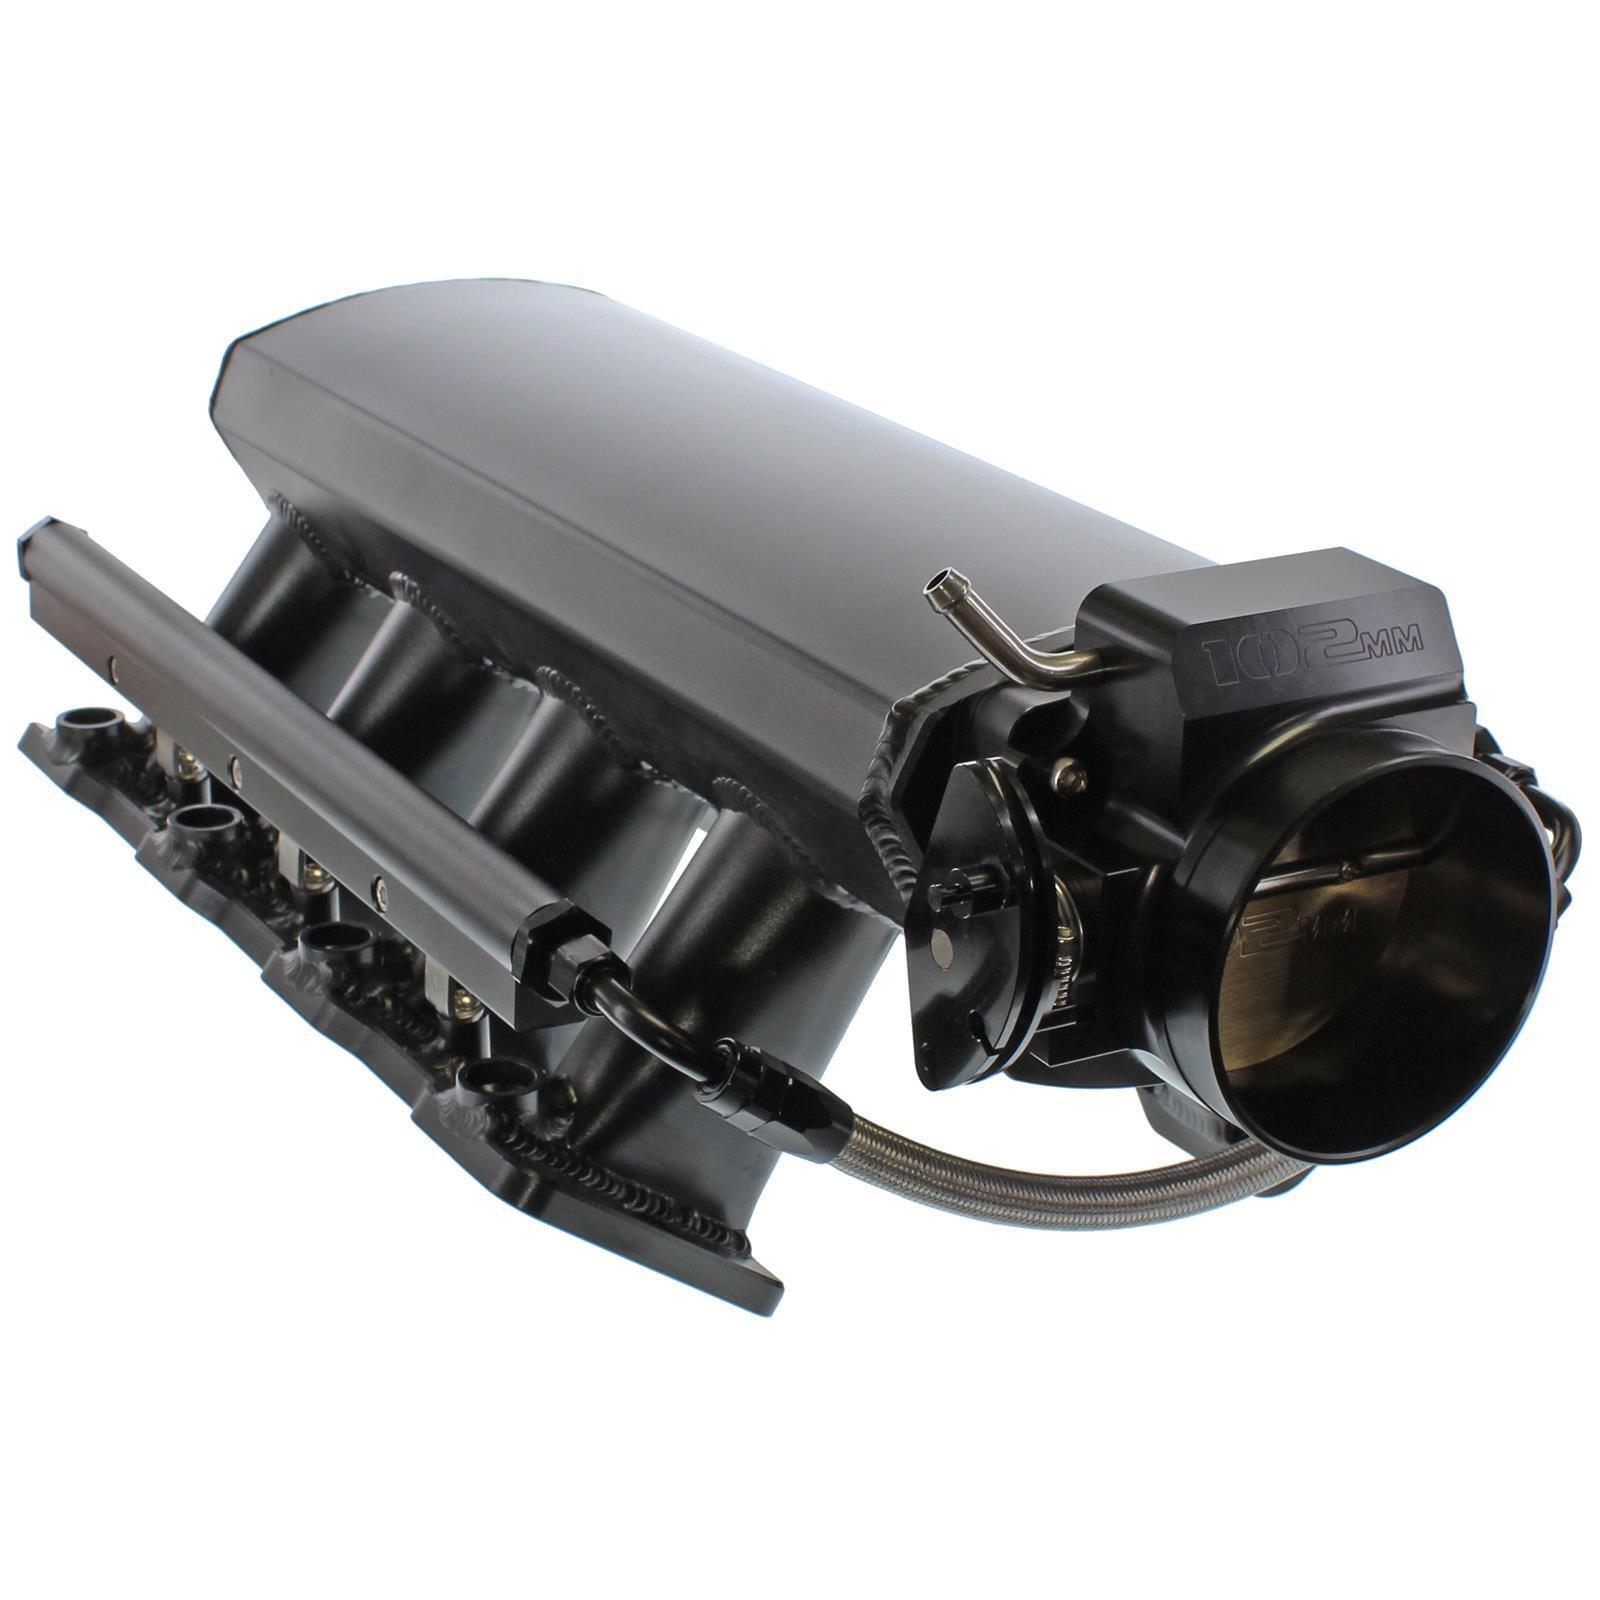 Ls Lsx Ls1 Ls2 Ls6 Fabricated Intake Manifold Kit Throttle